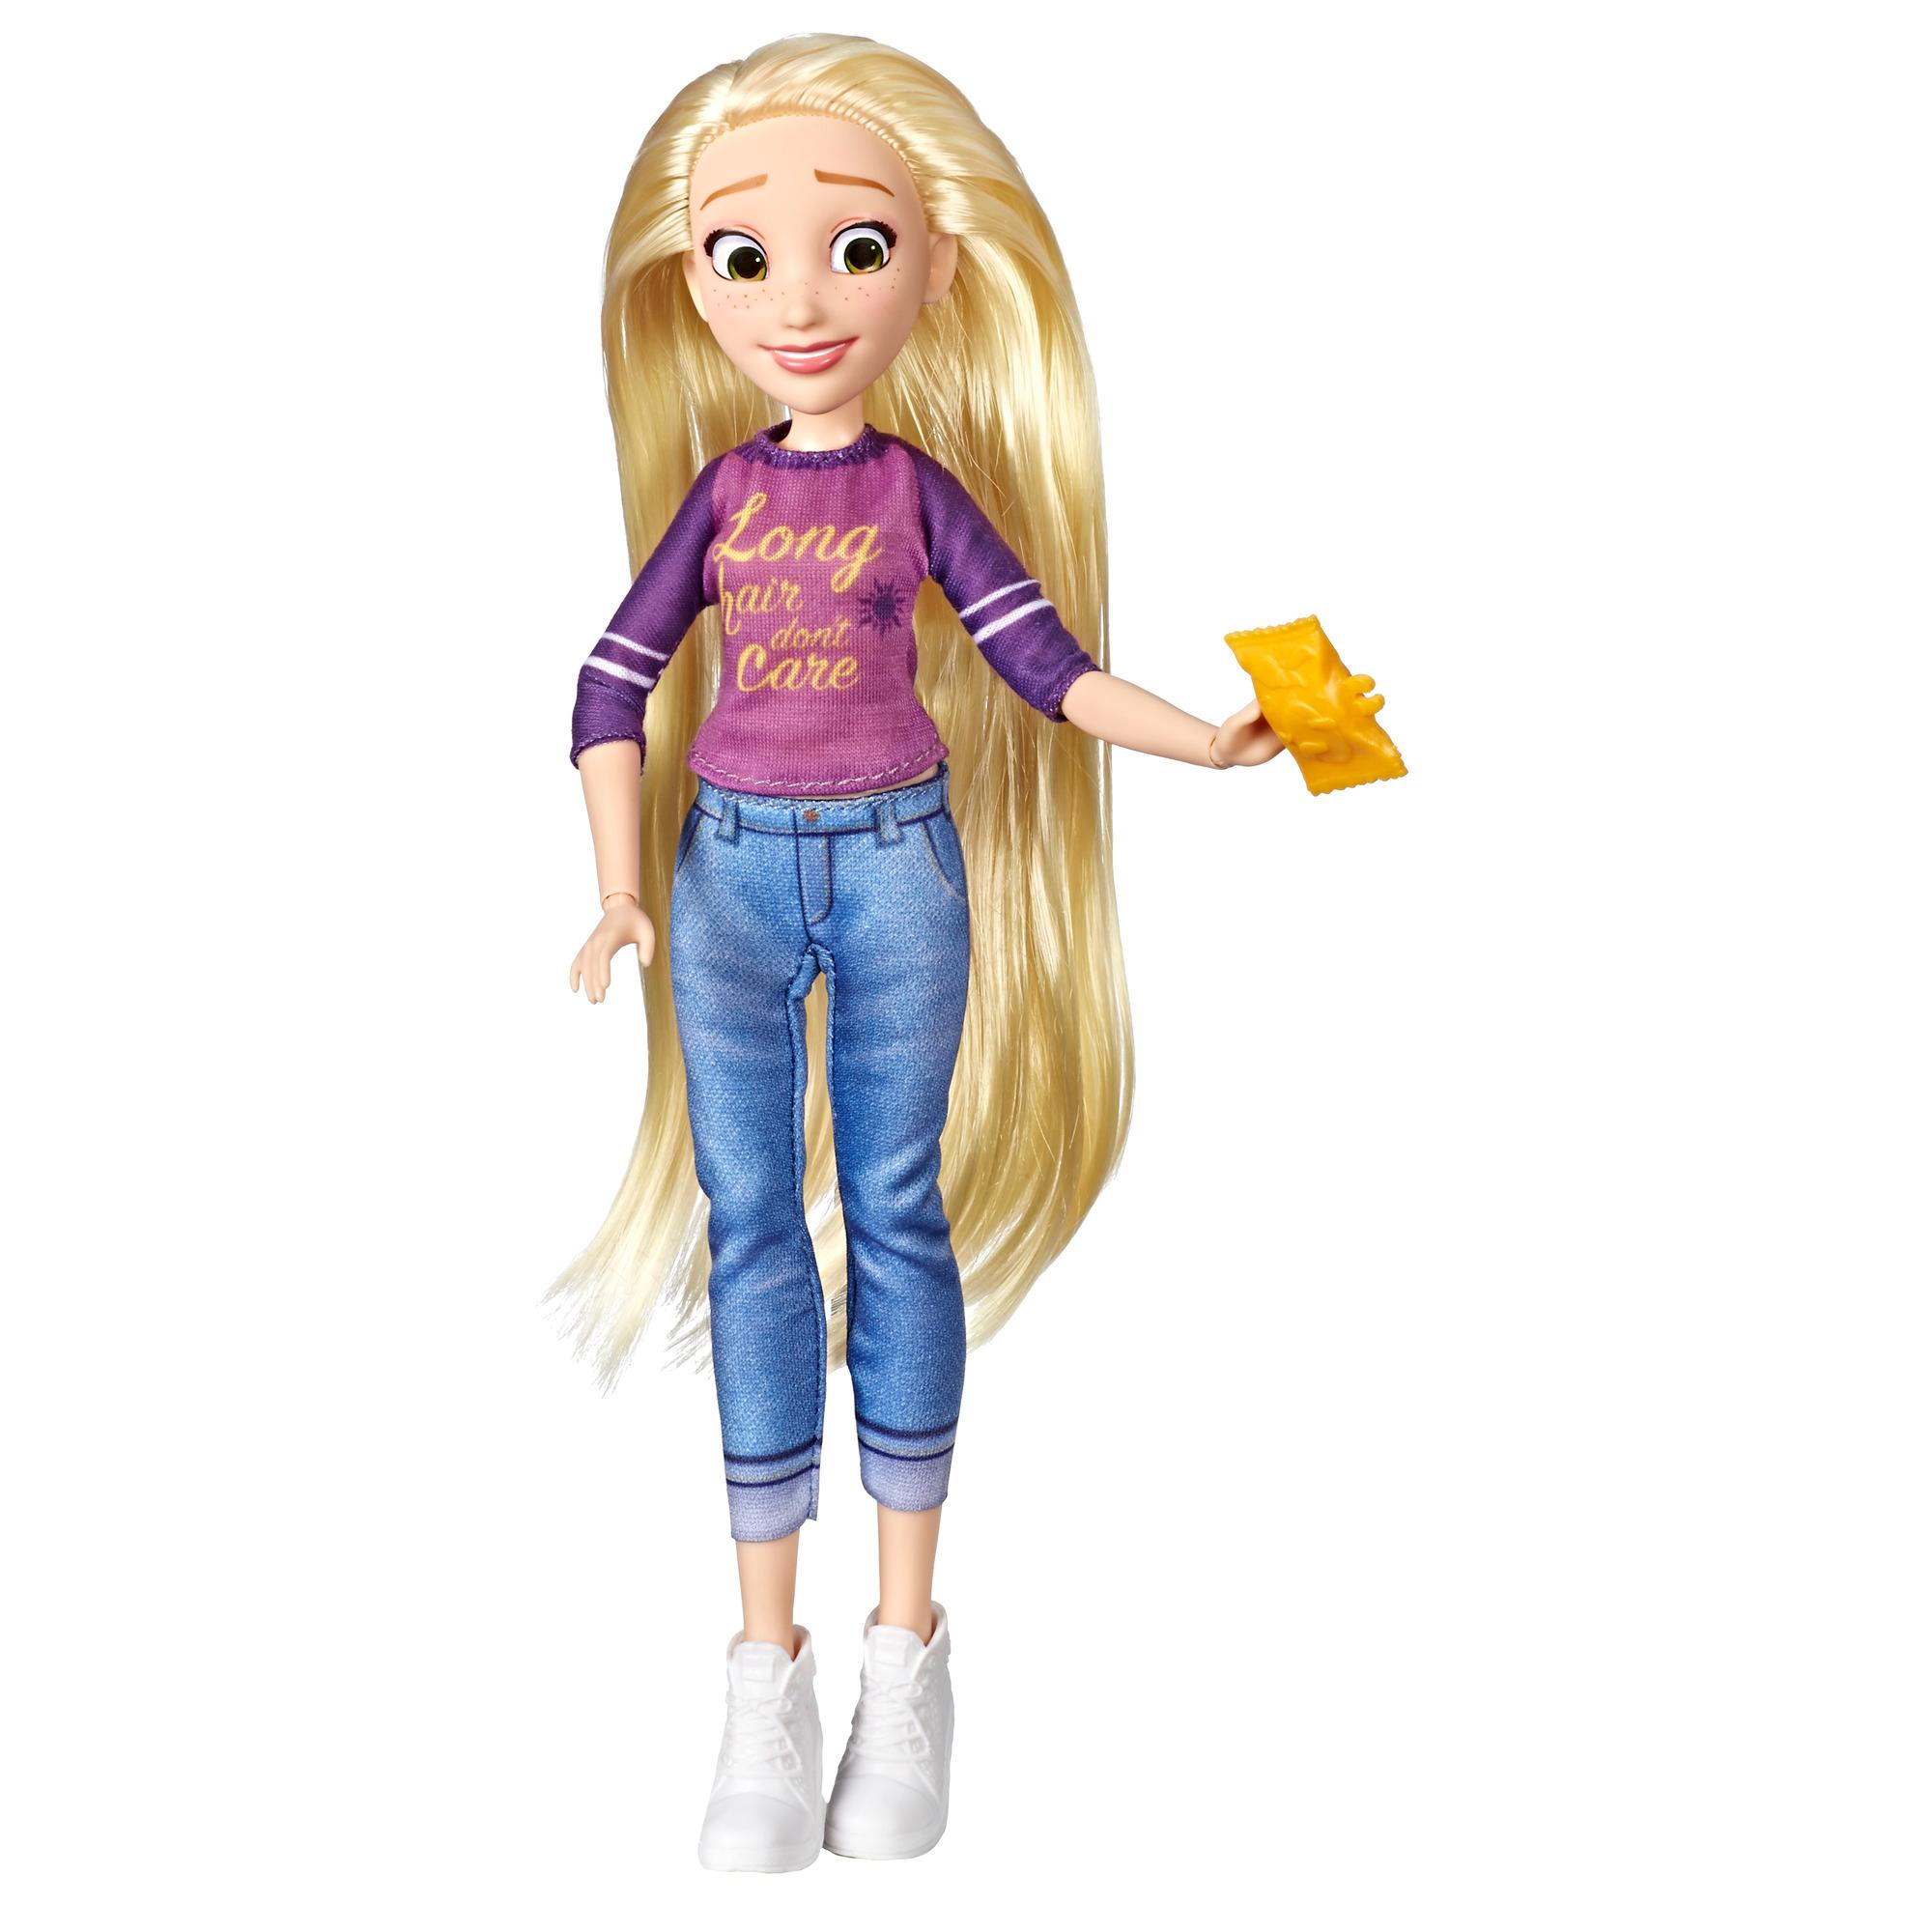 Disney Princess Comfy Squad Rapunzel, Ralph Breaks the Internet Movie Doll